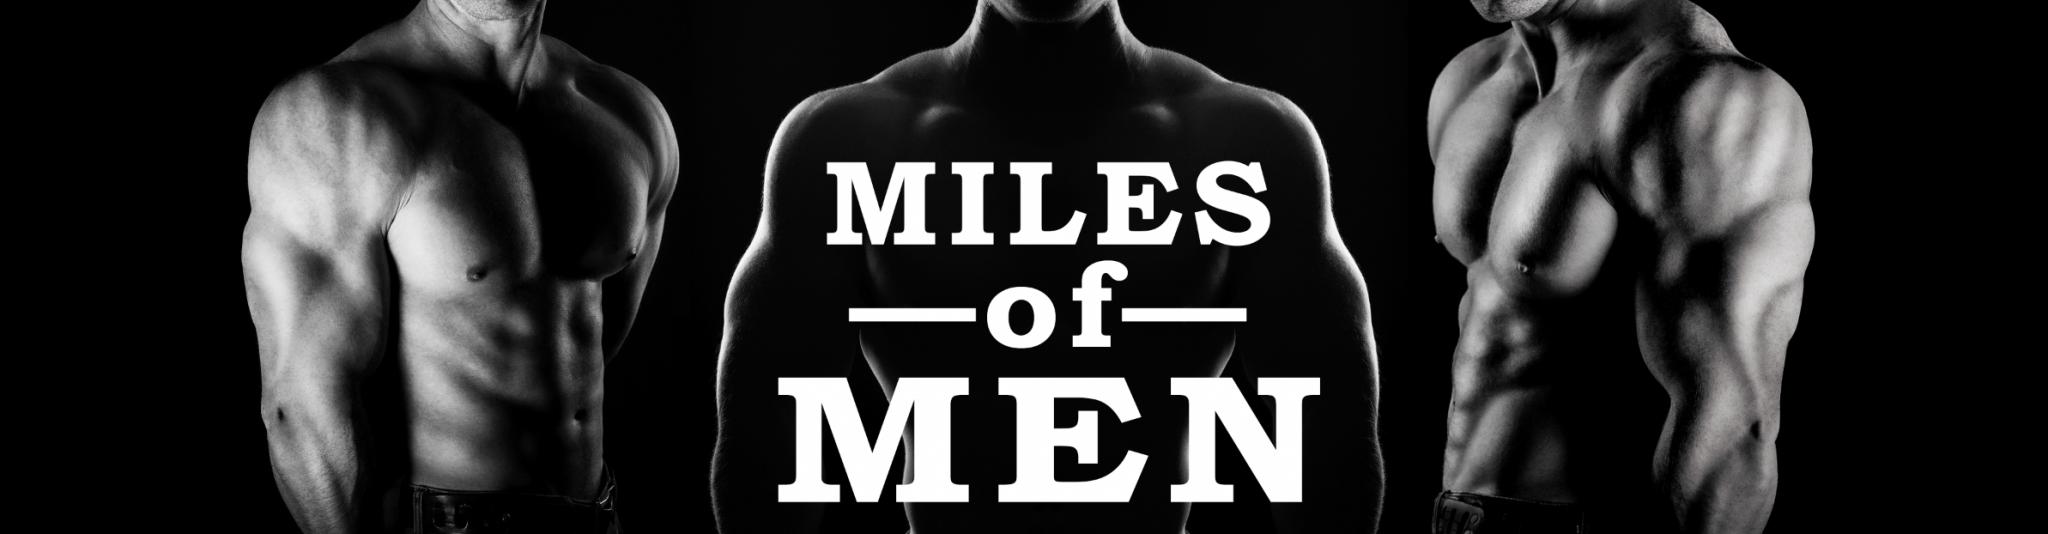 Miles of Men 2